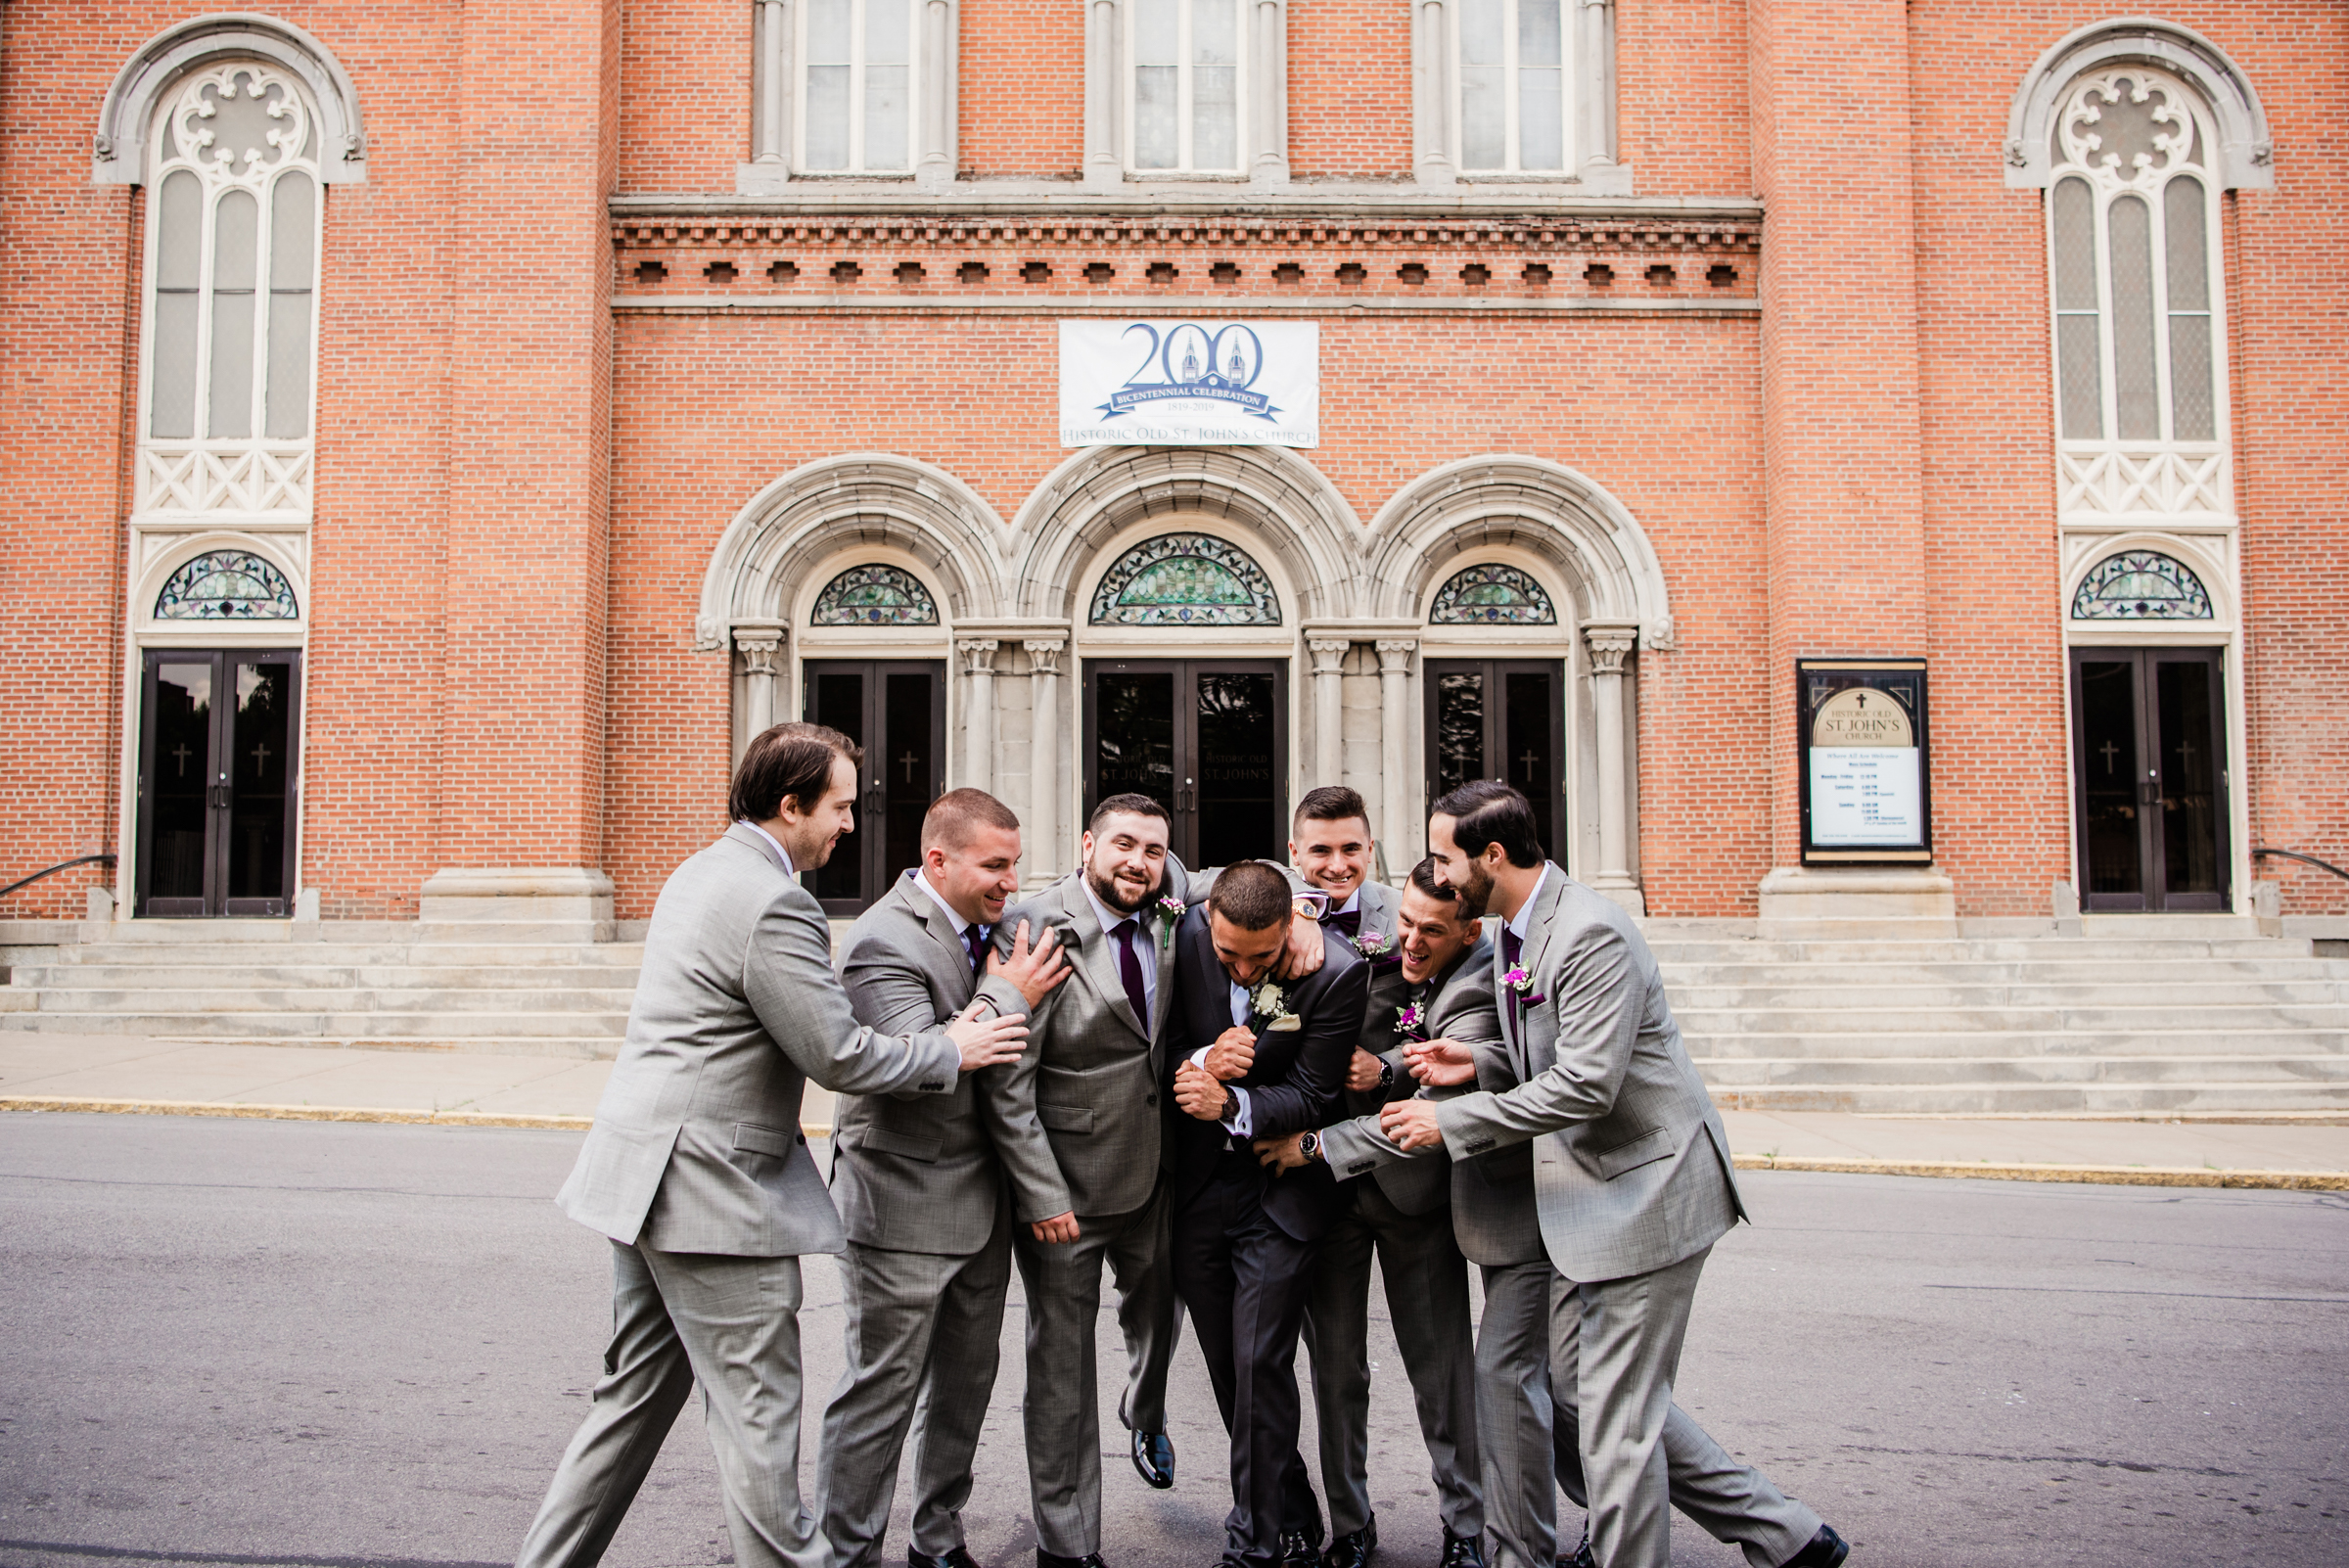 Historic_Old_St_Johns_Church_Valentinos_Banquet_Hall_Central_NY_Wedding_JILL_STUDIO_Rochester_NY_Photographer_DSC_5602.jpg